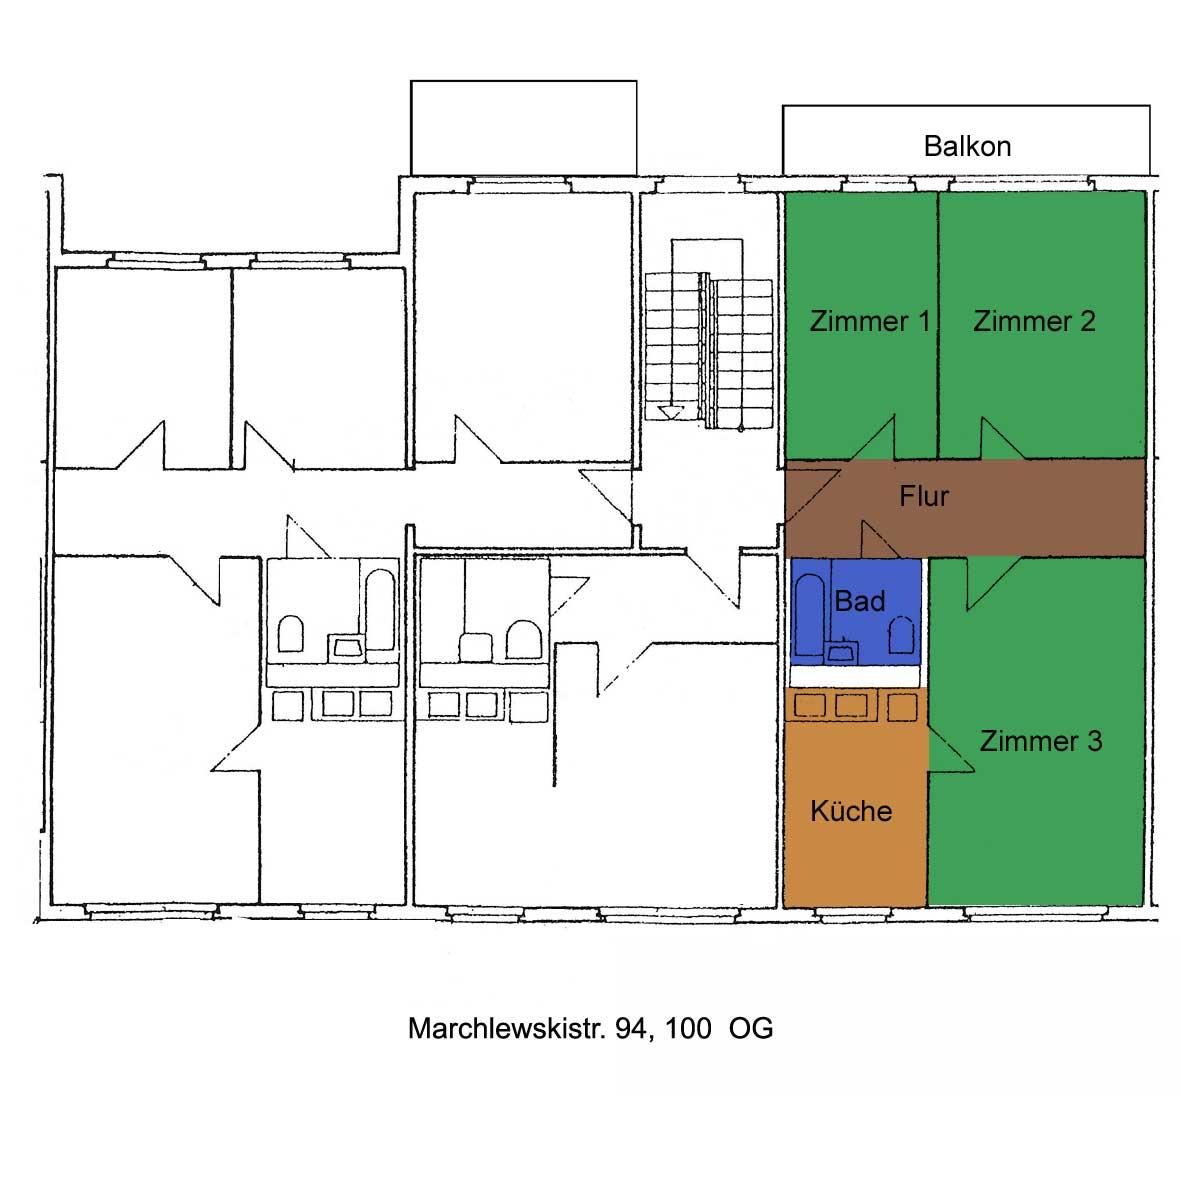 Grundriss Marchlewskistraße 94, 100, OG links